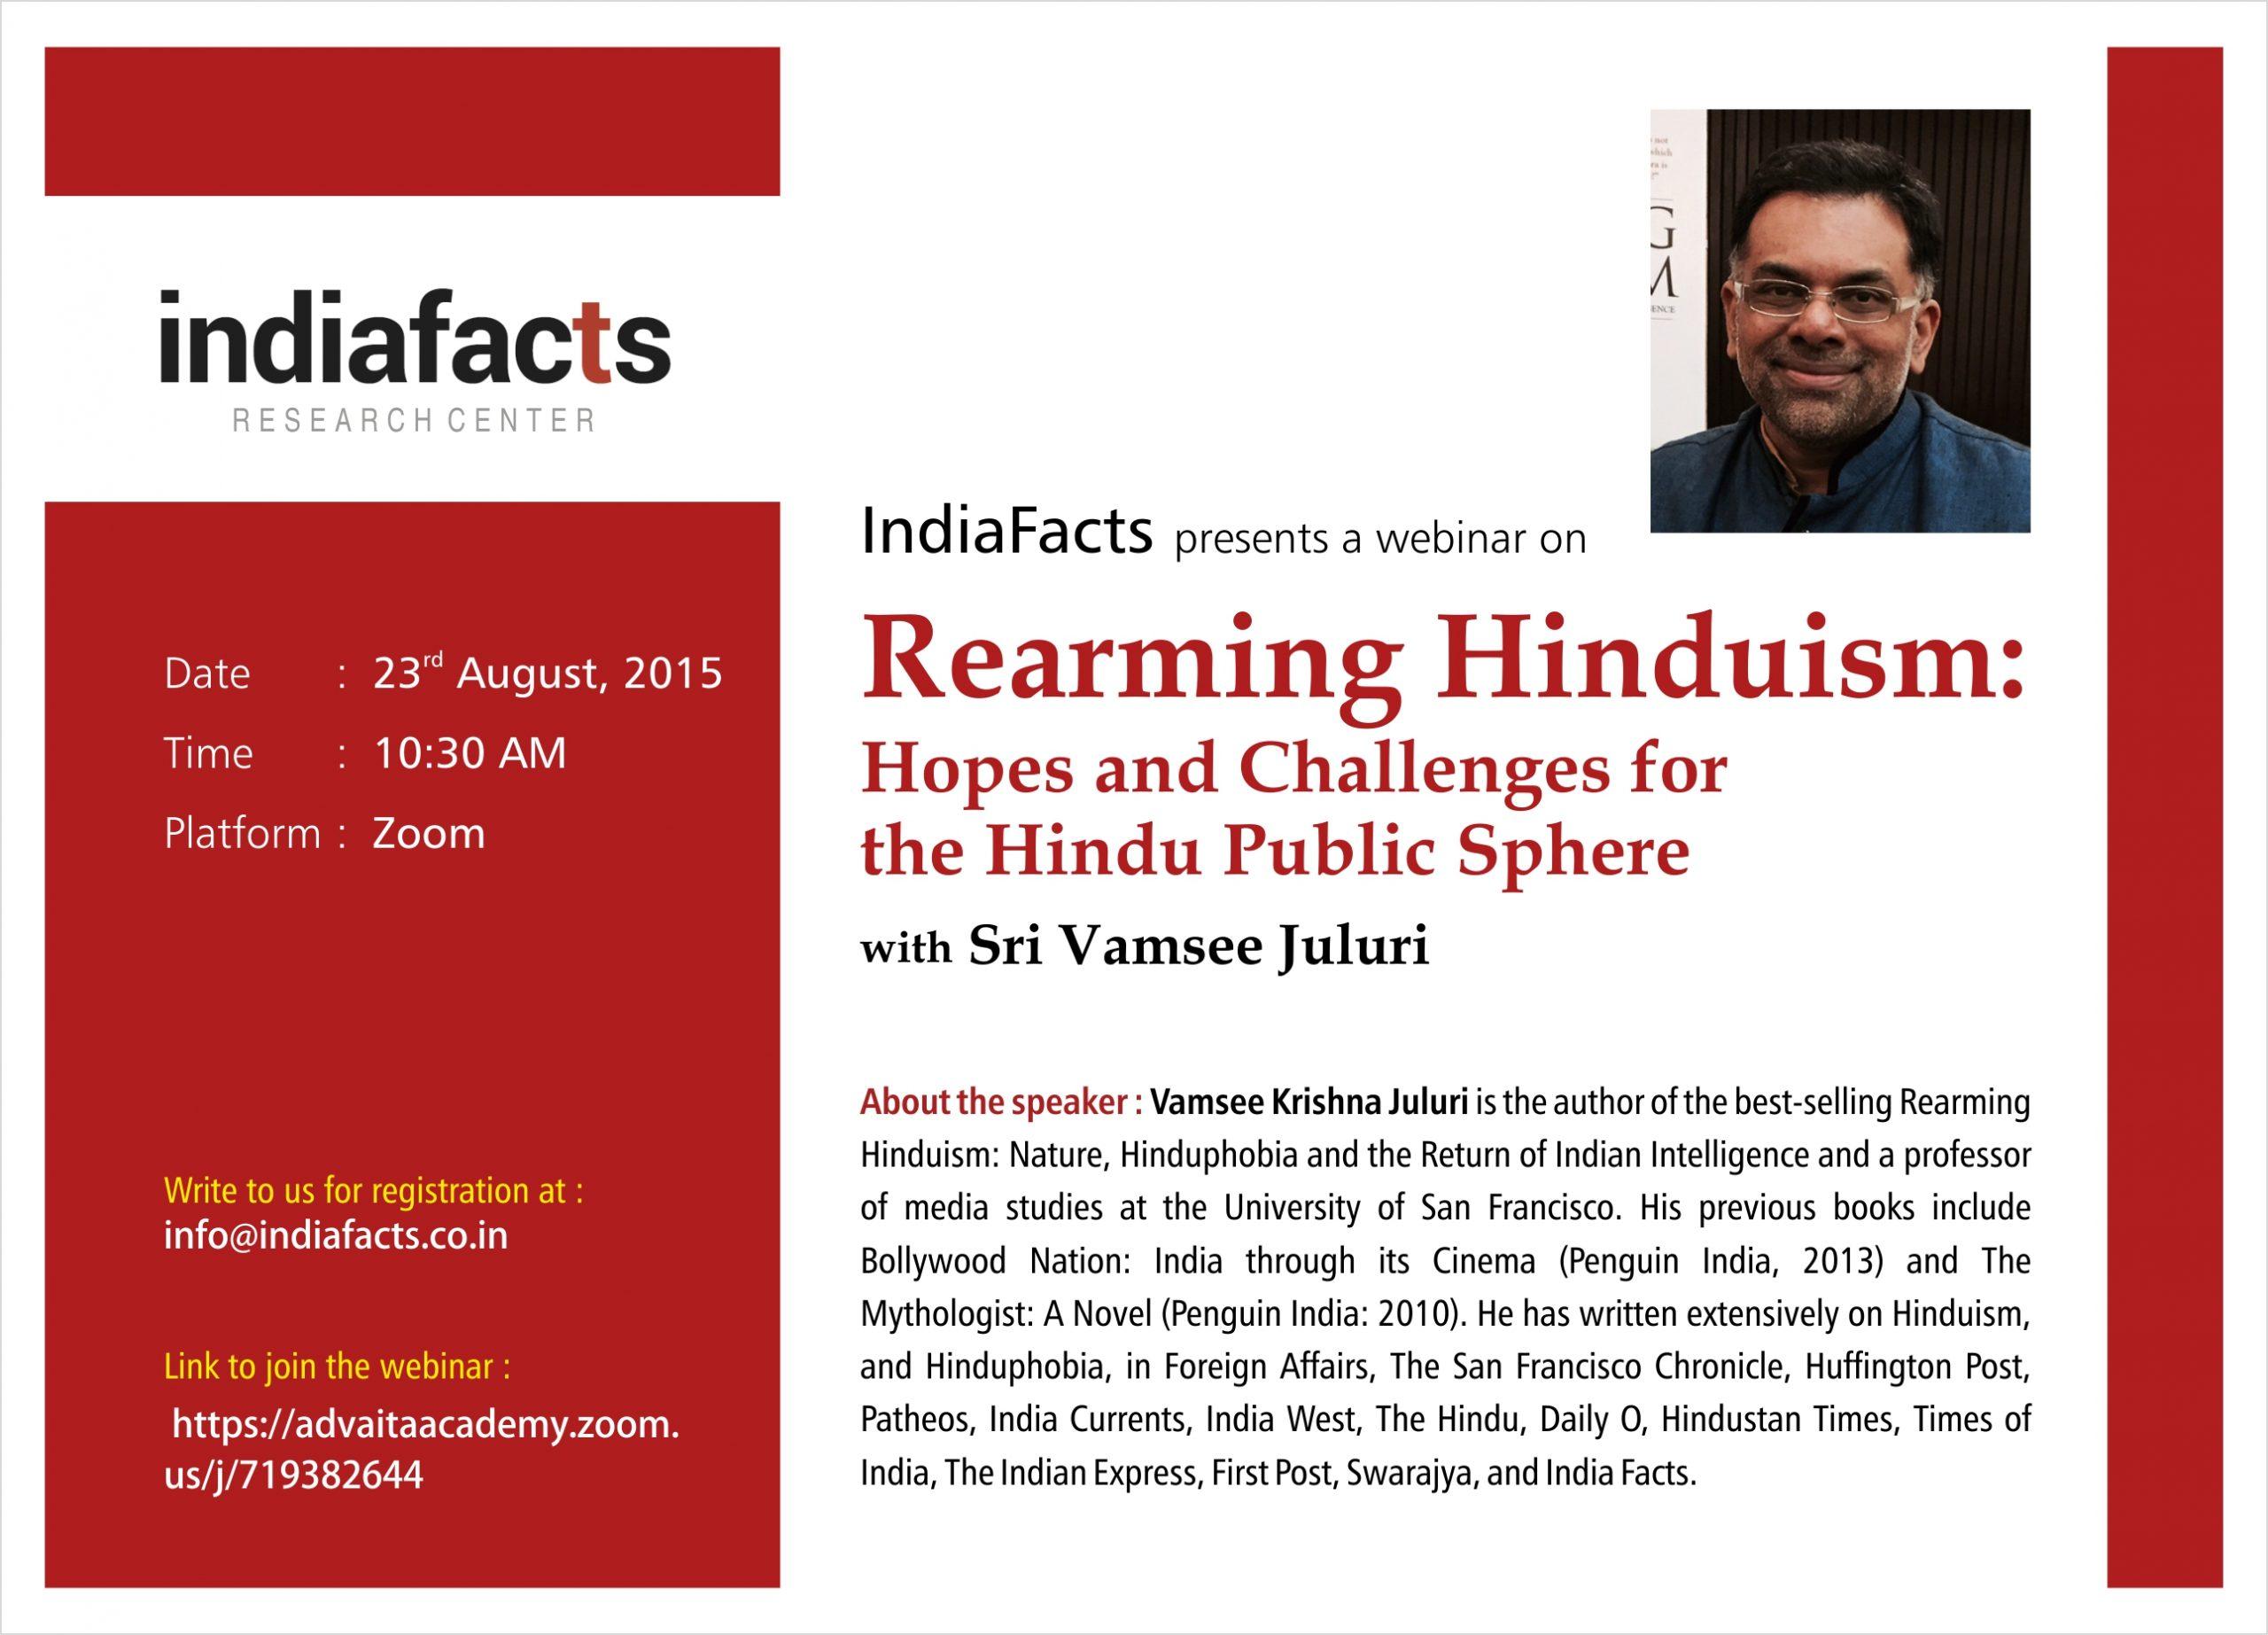 IndiaFacts Webinar: Rearming Hinduism